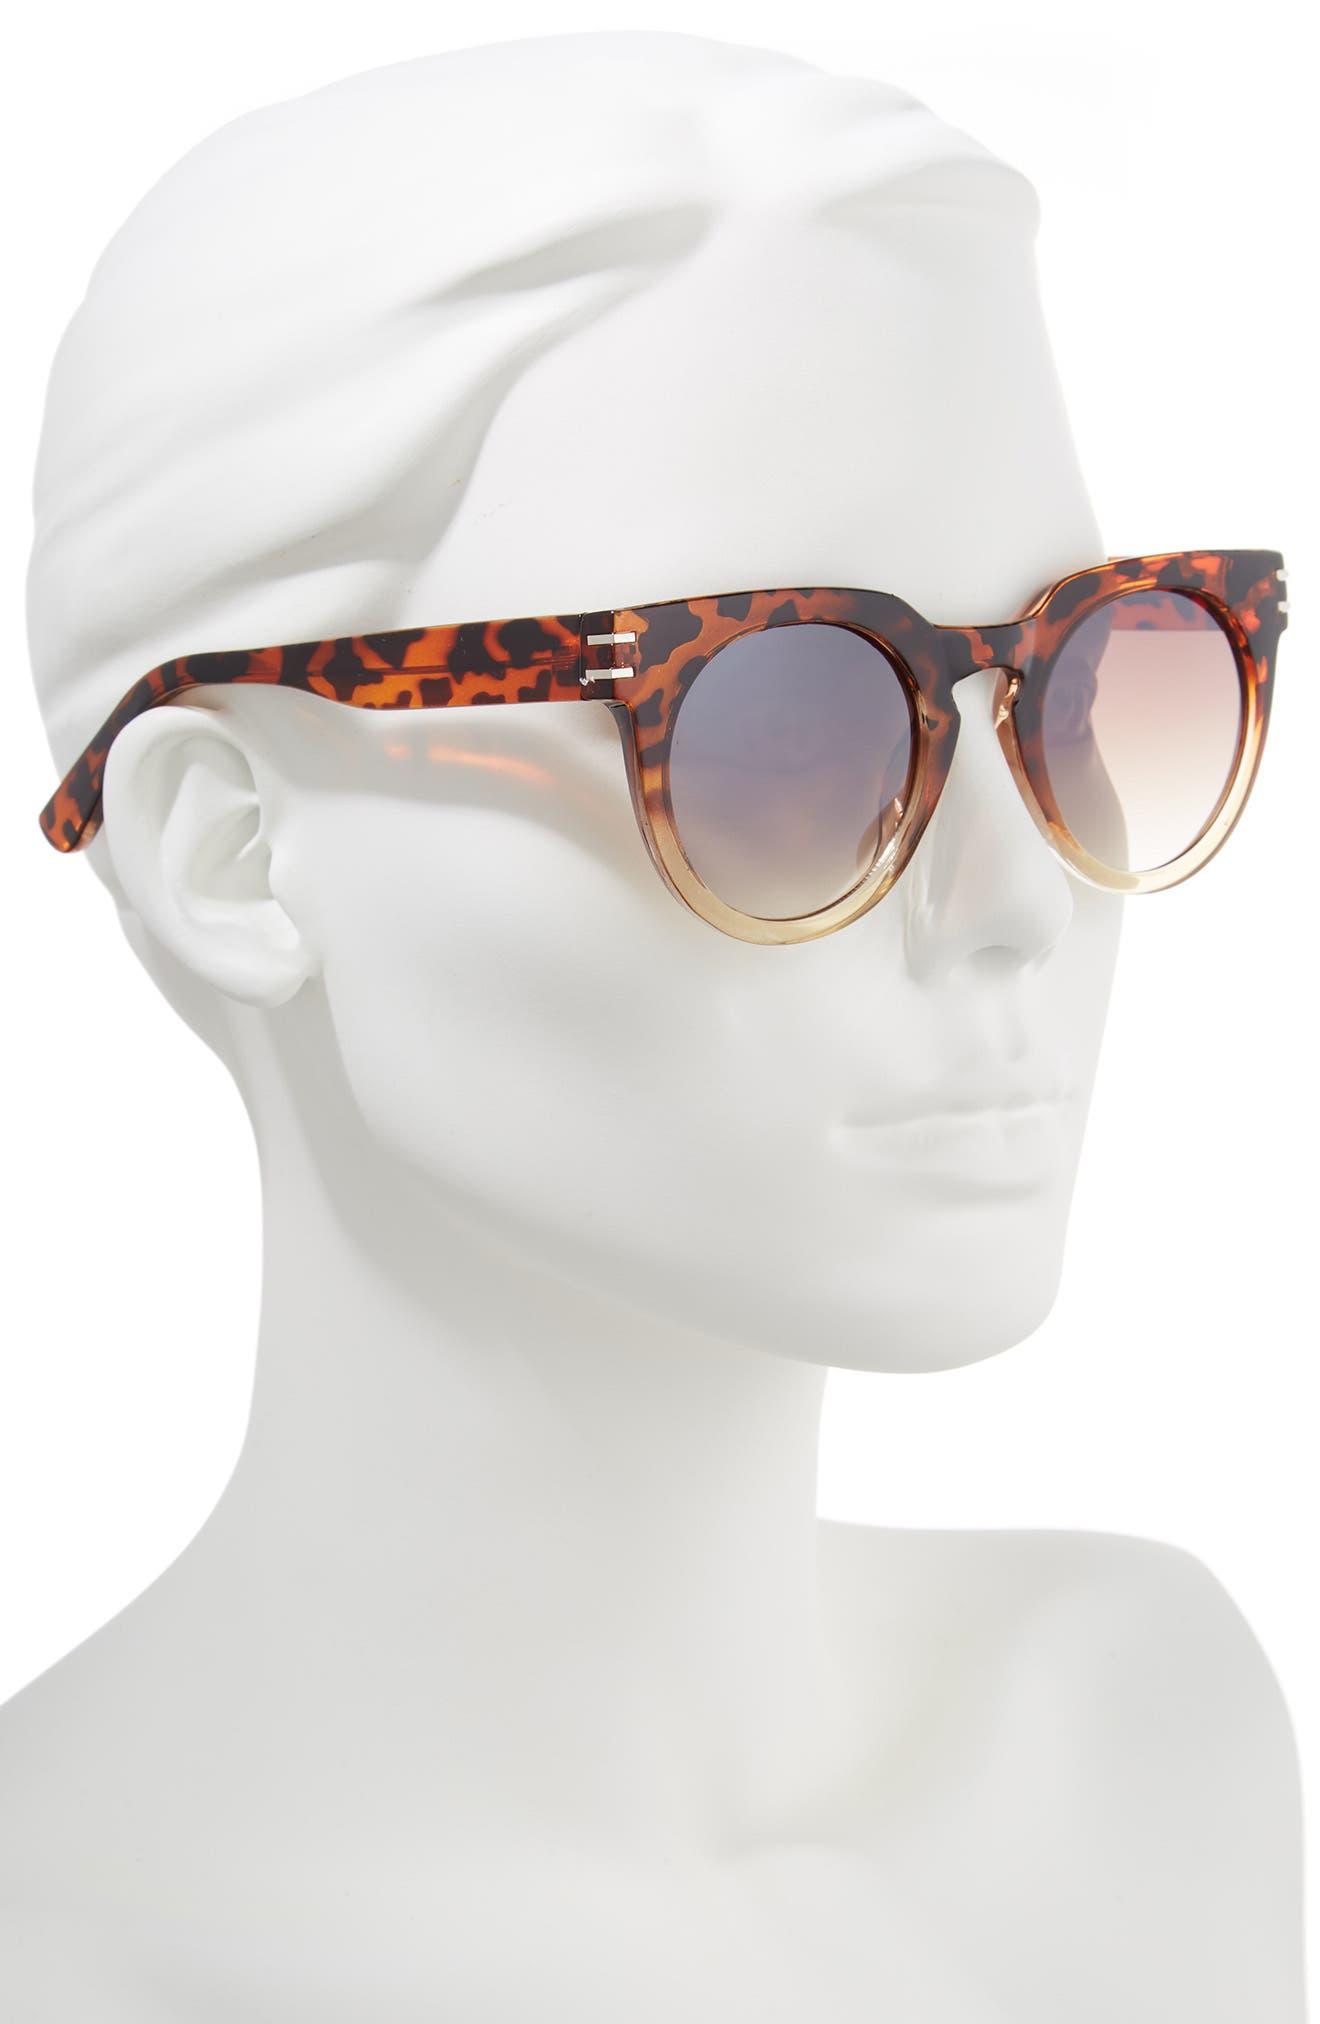 50mm Round Sunglasses,                             Alternate thumbnail 2, color,                             200